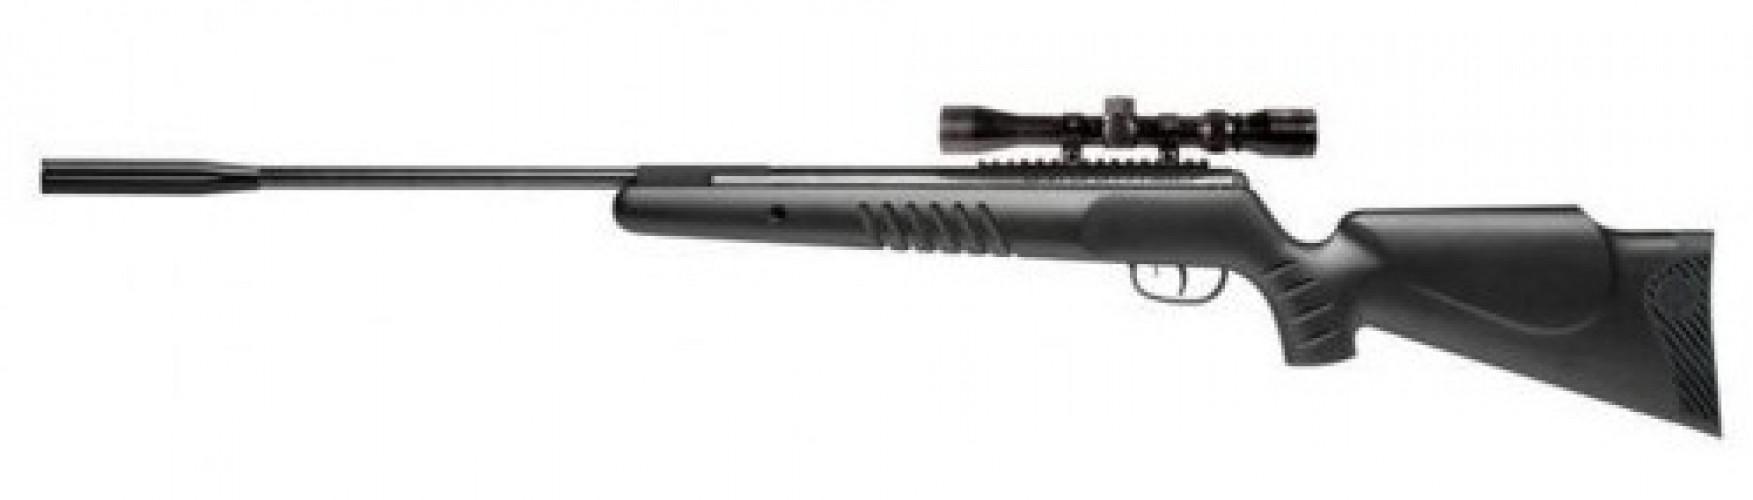 Пневматическая винтовка Crosman Venom 8-CD1K77NP